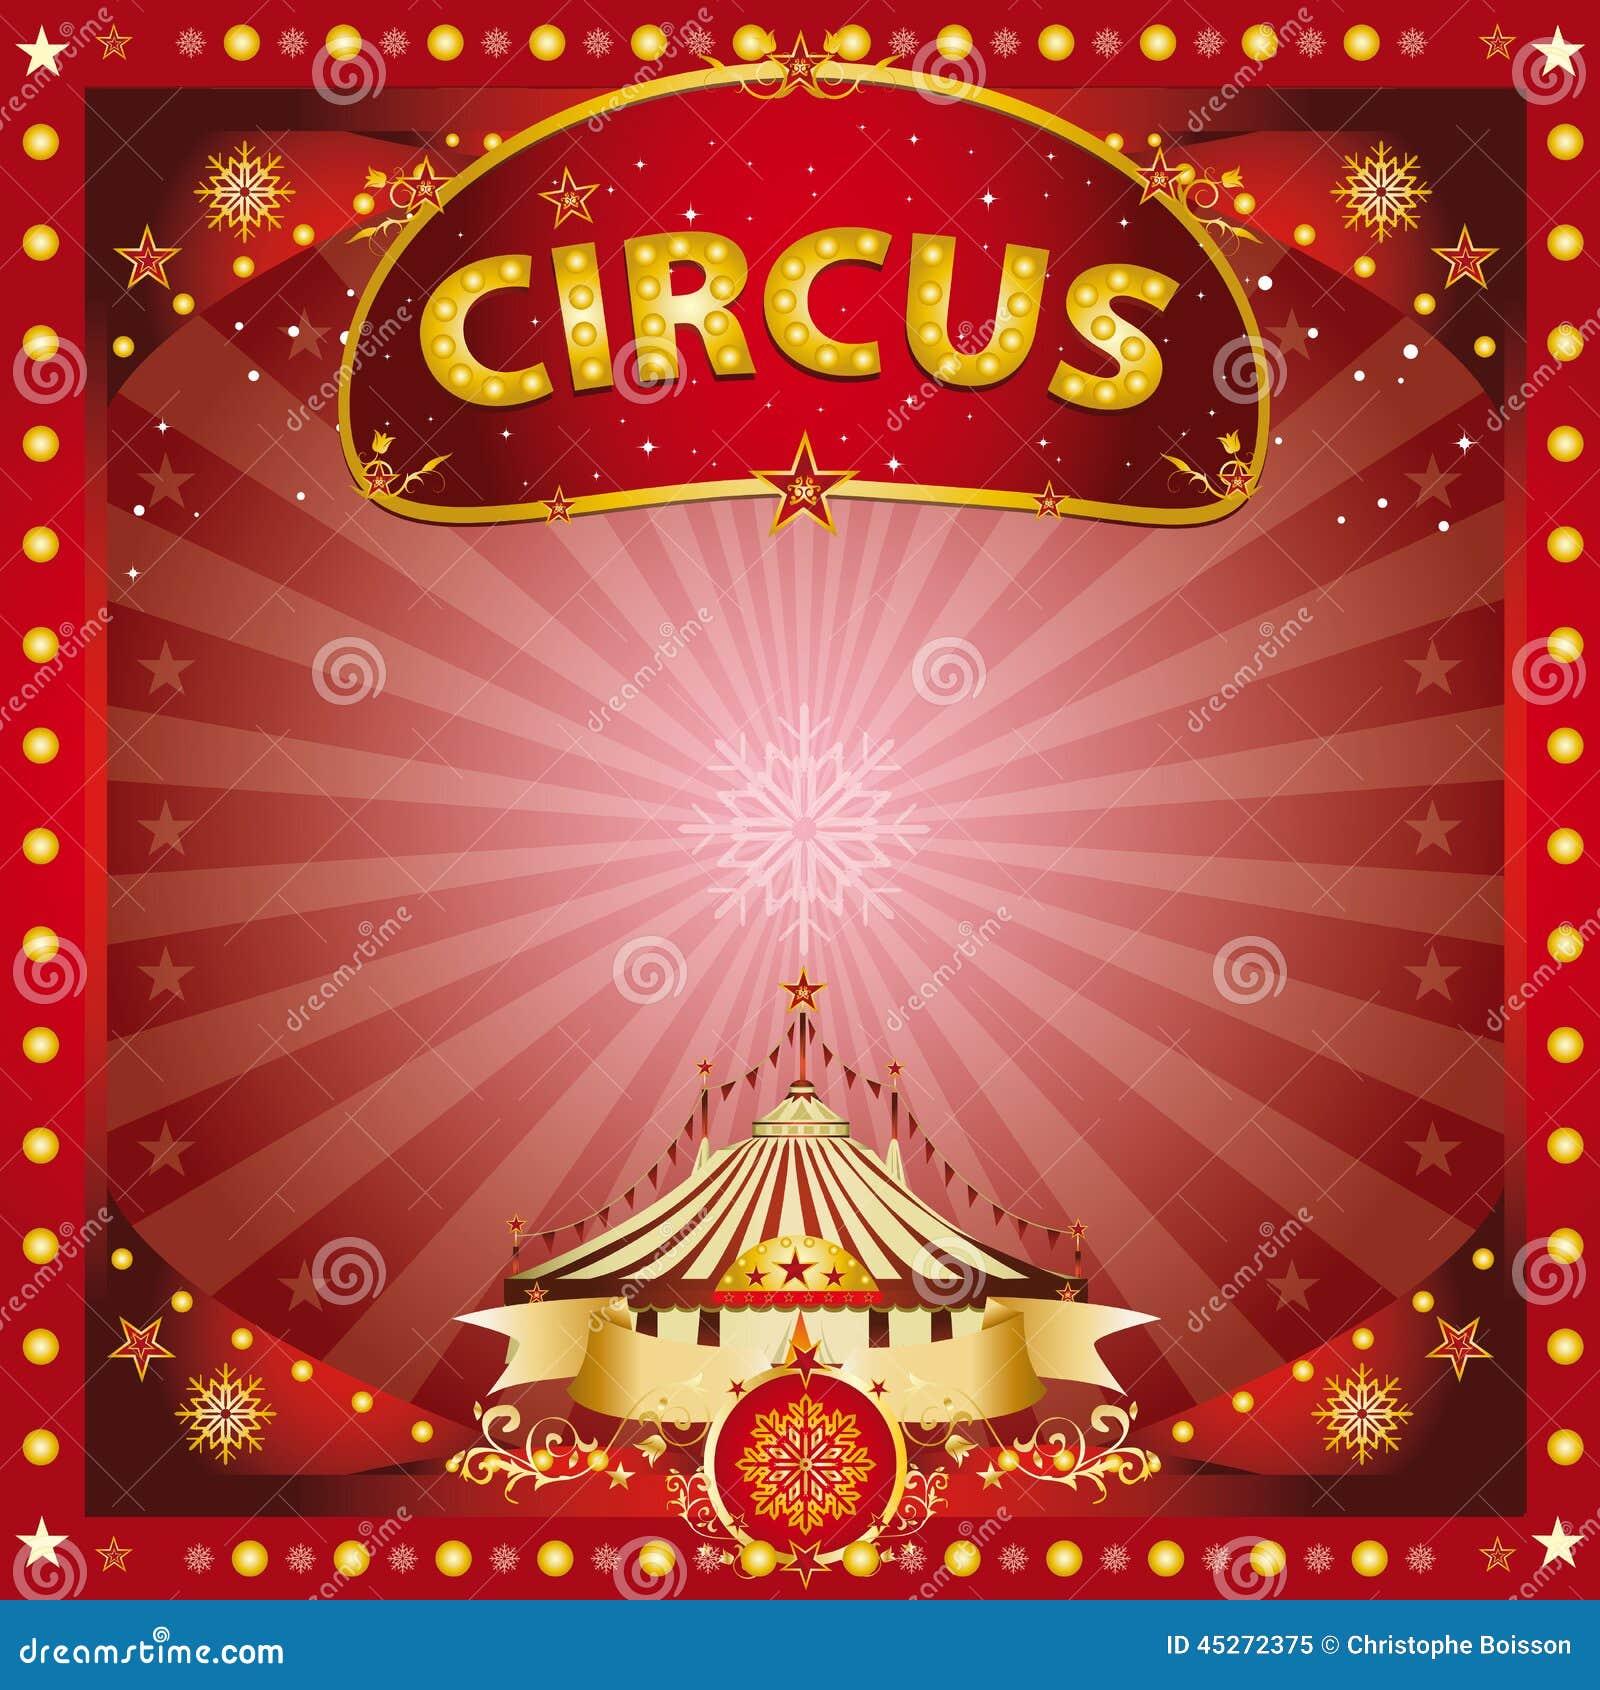 Circus circus new years 28 images special circus show - Saludos de navidad ...